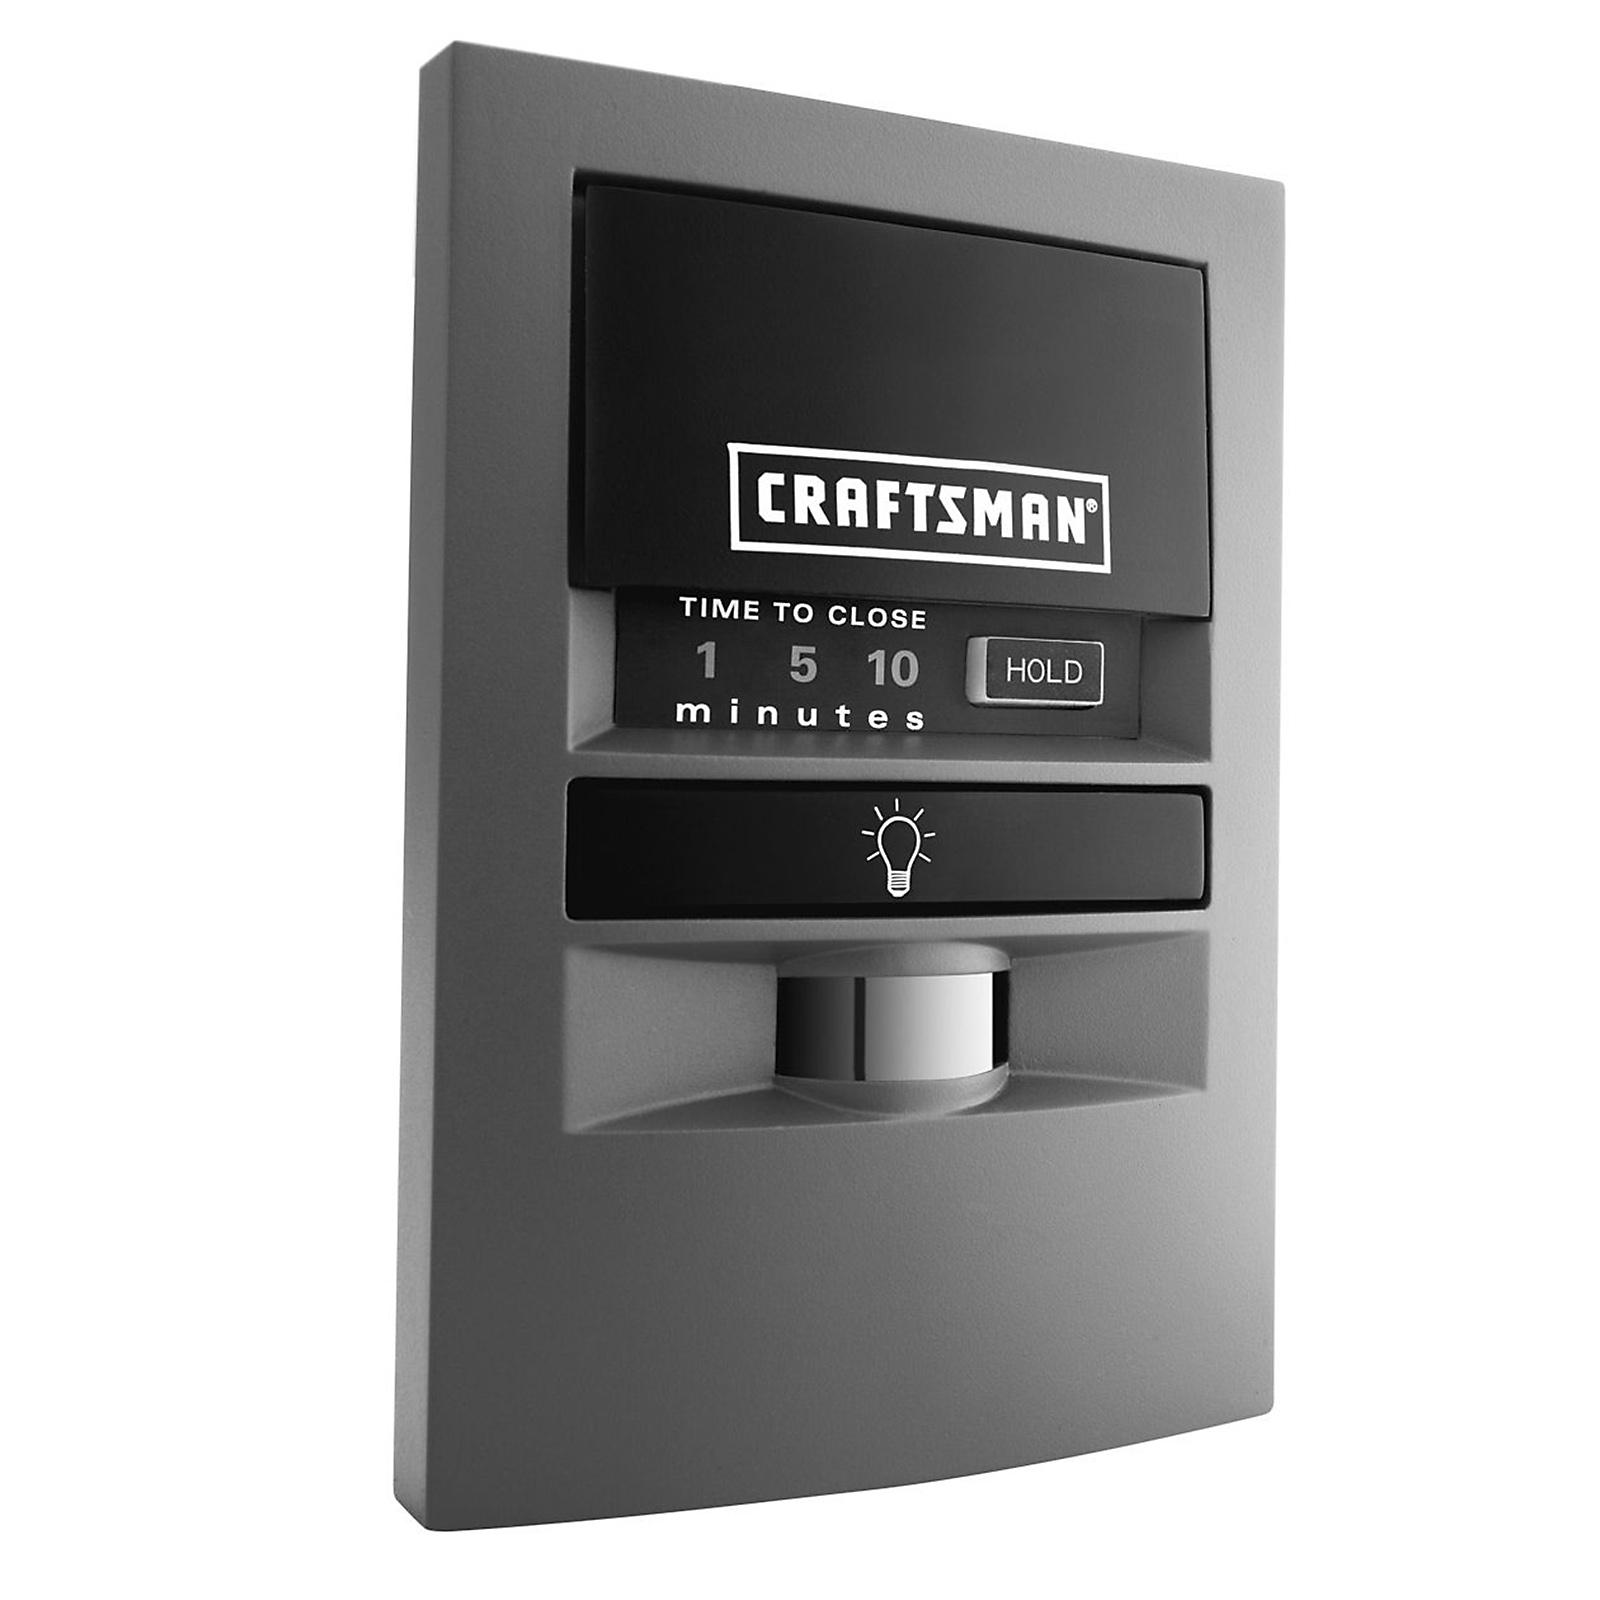 Craftsman AssureLink™ Internet Connected DC Chain Drive Garage Door Opener - No Annual Fees, Free App Download